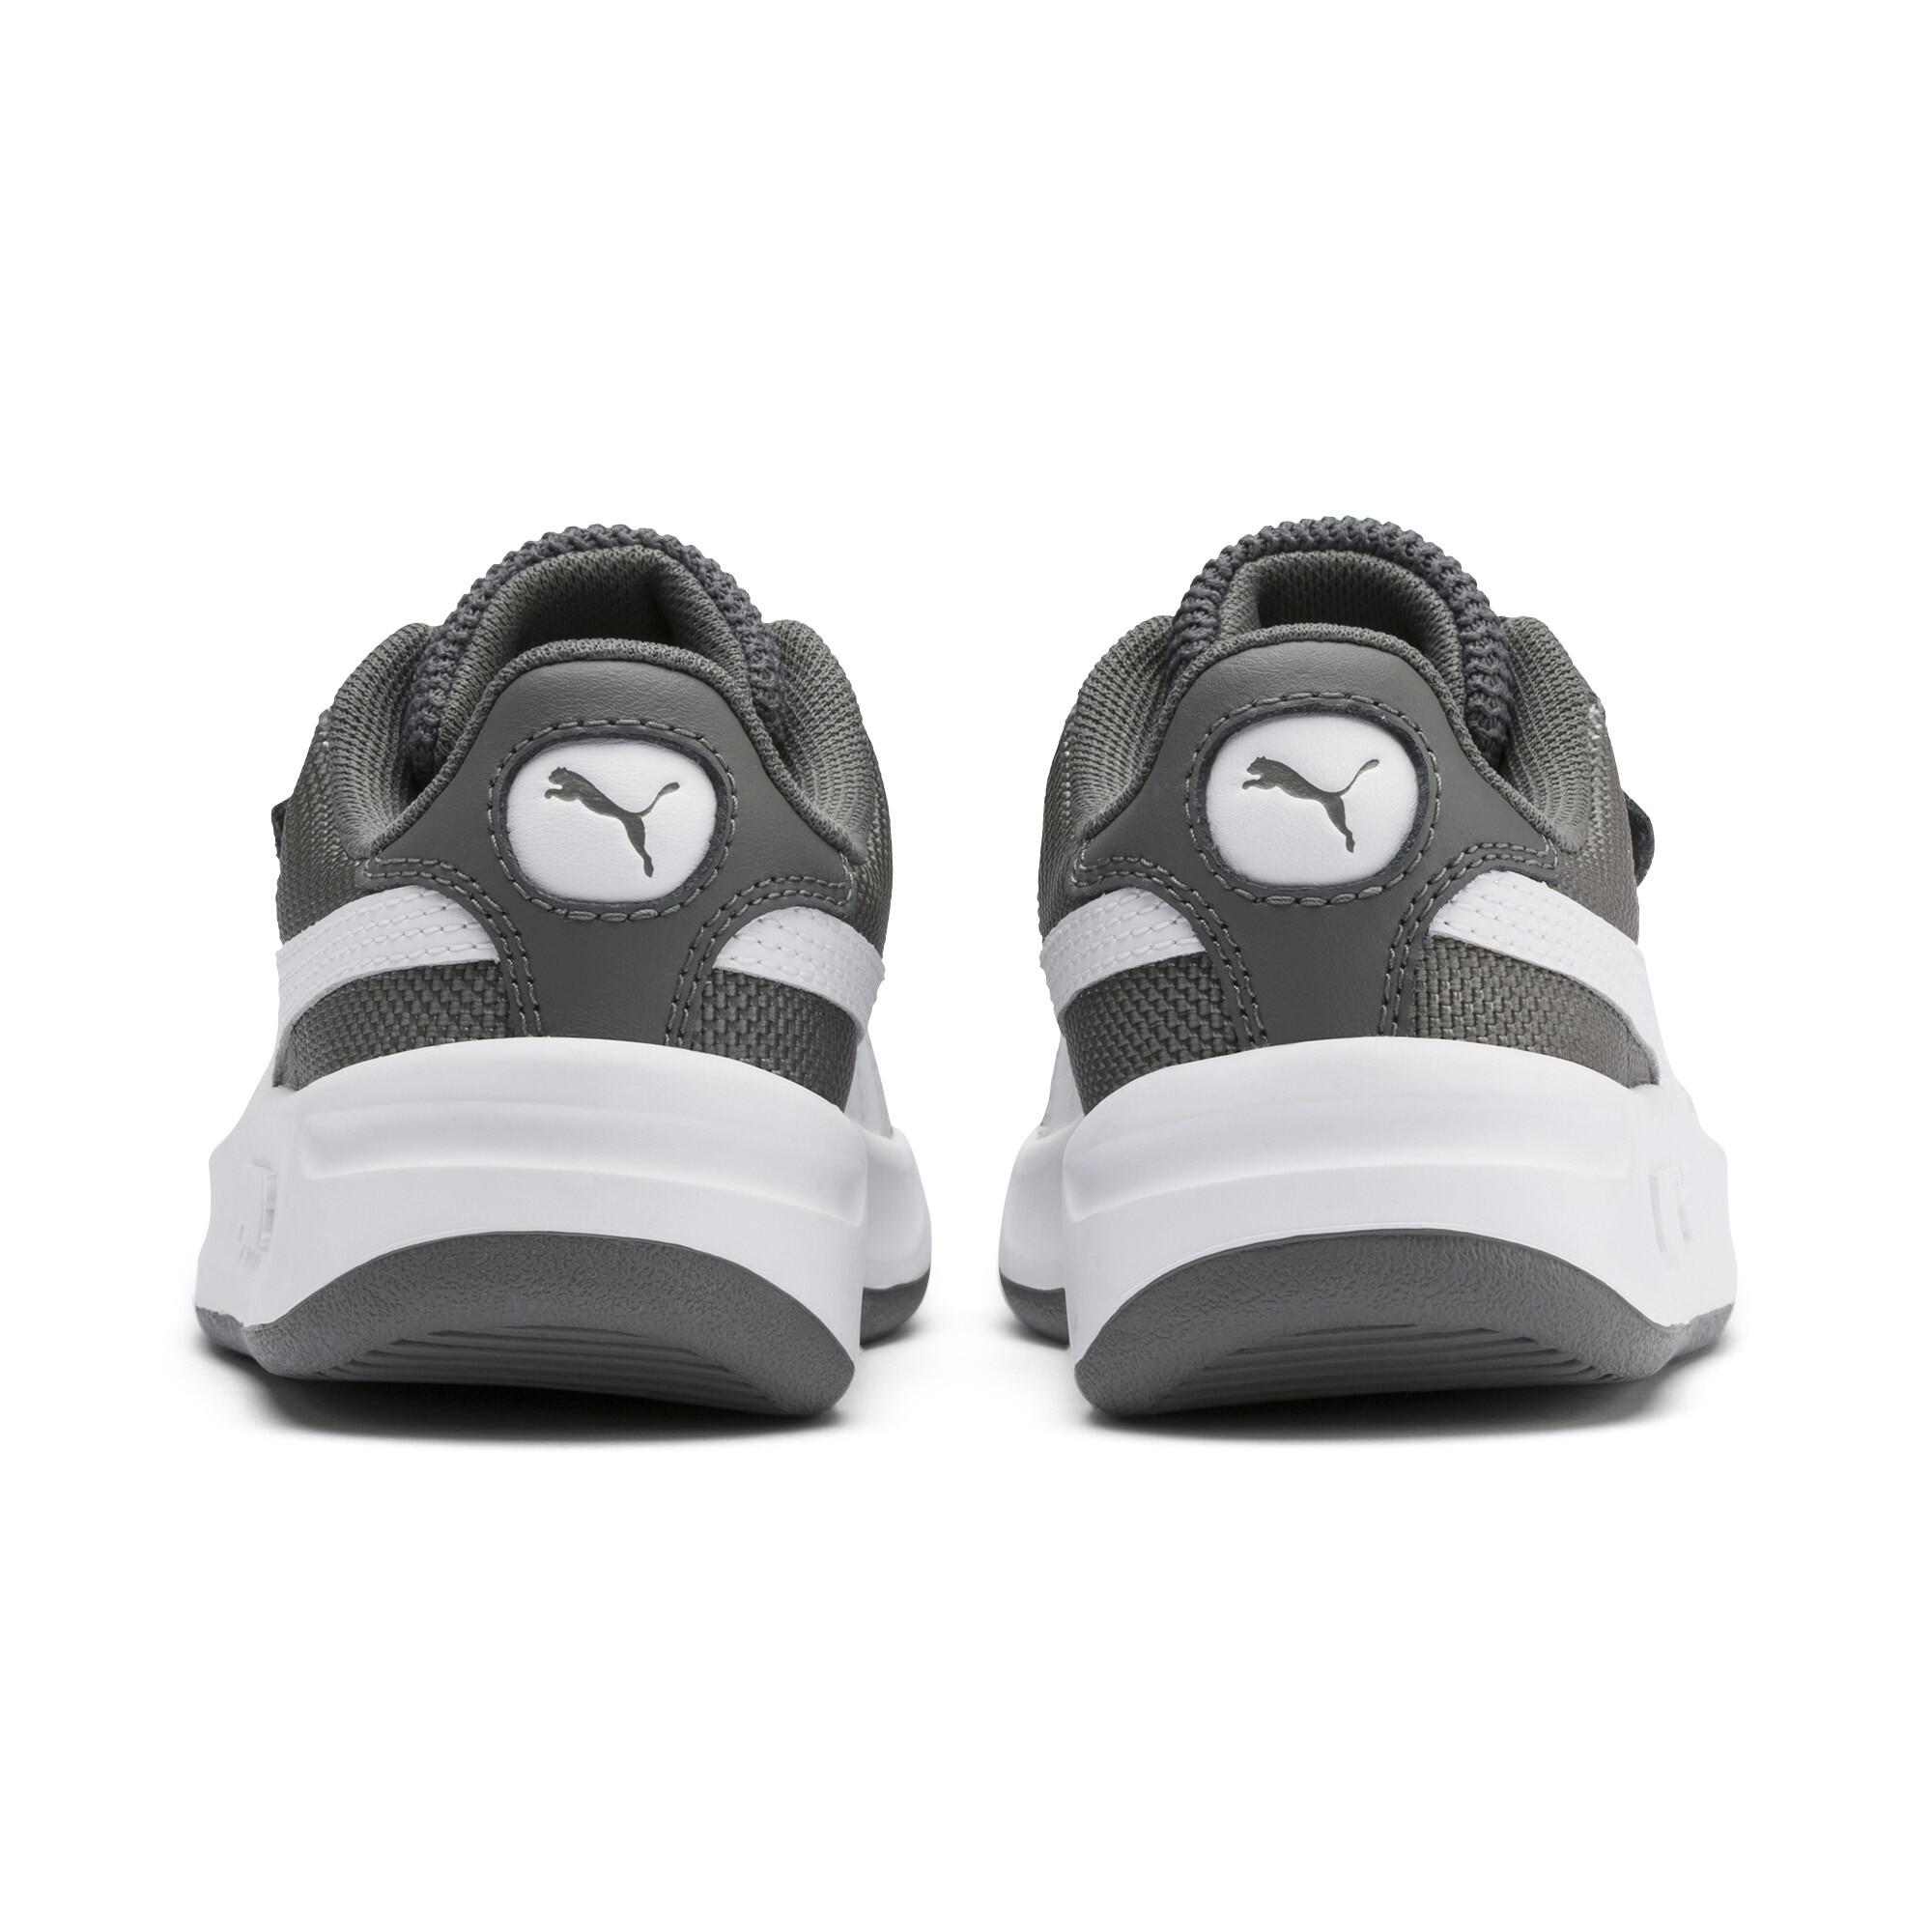 PUMA-California-Little-Kids-039-Shoes-Kids-Shoe-Kids thumbnail 15